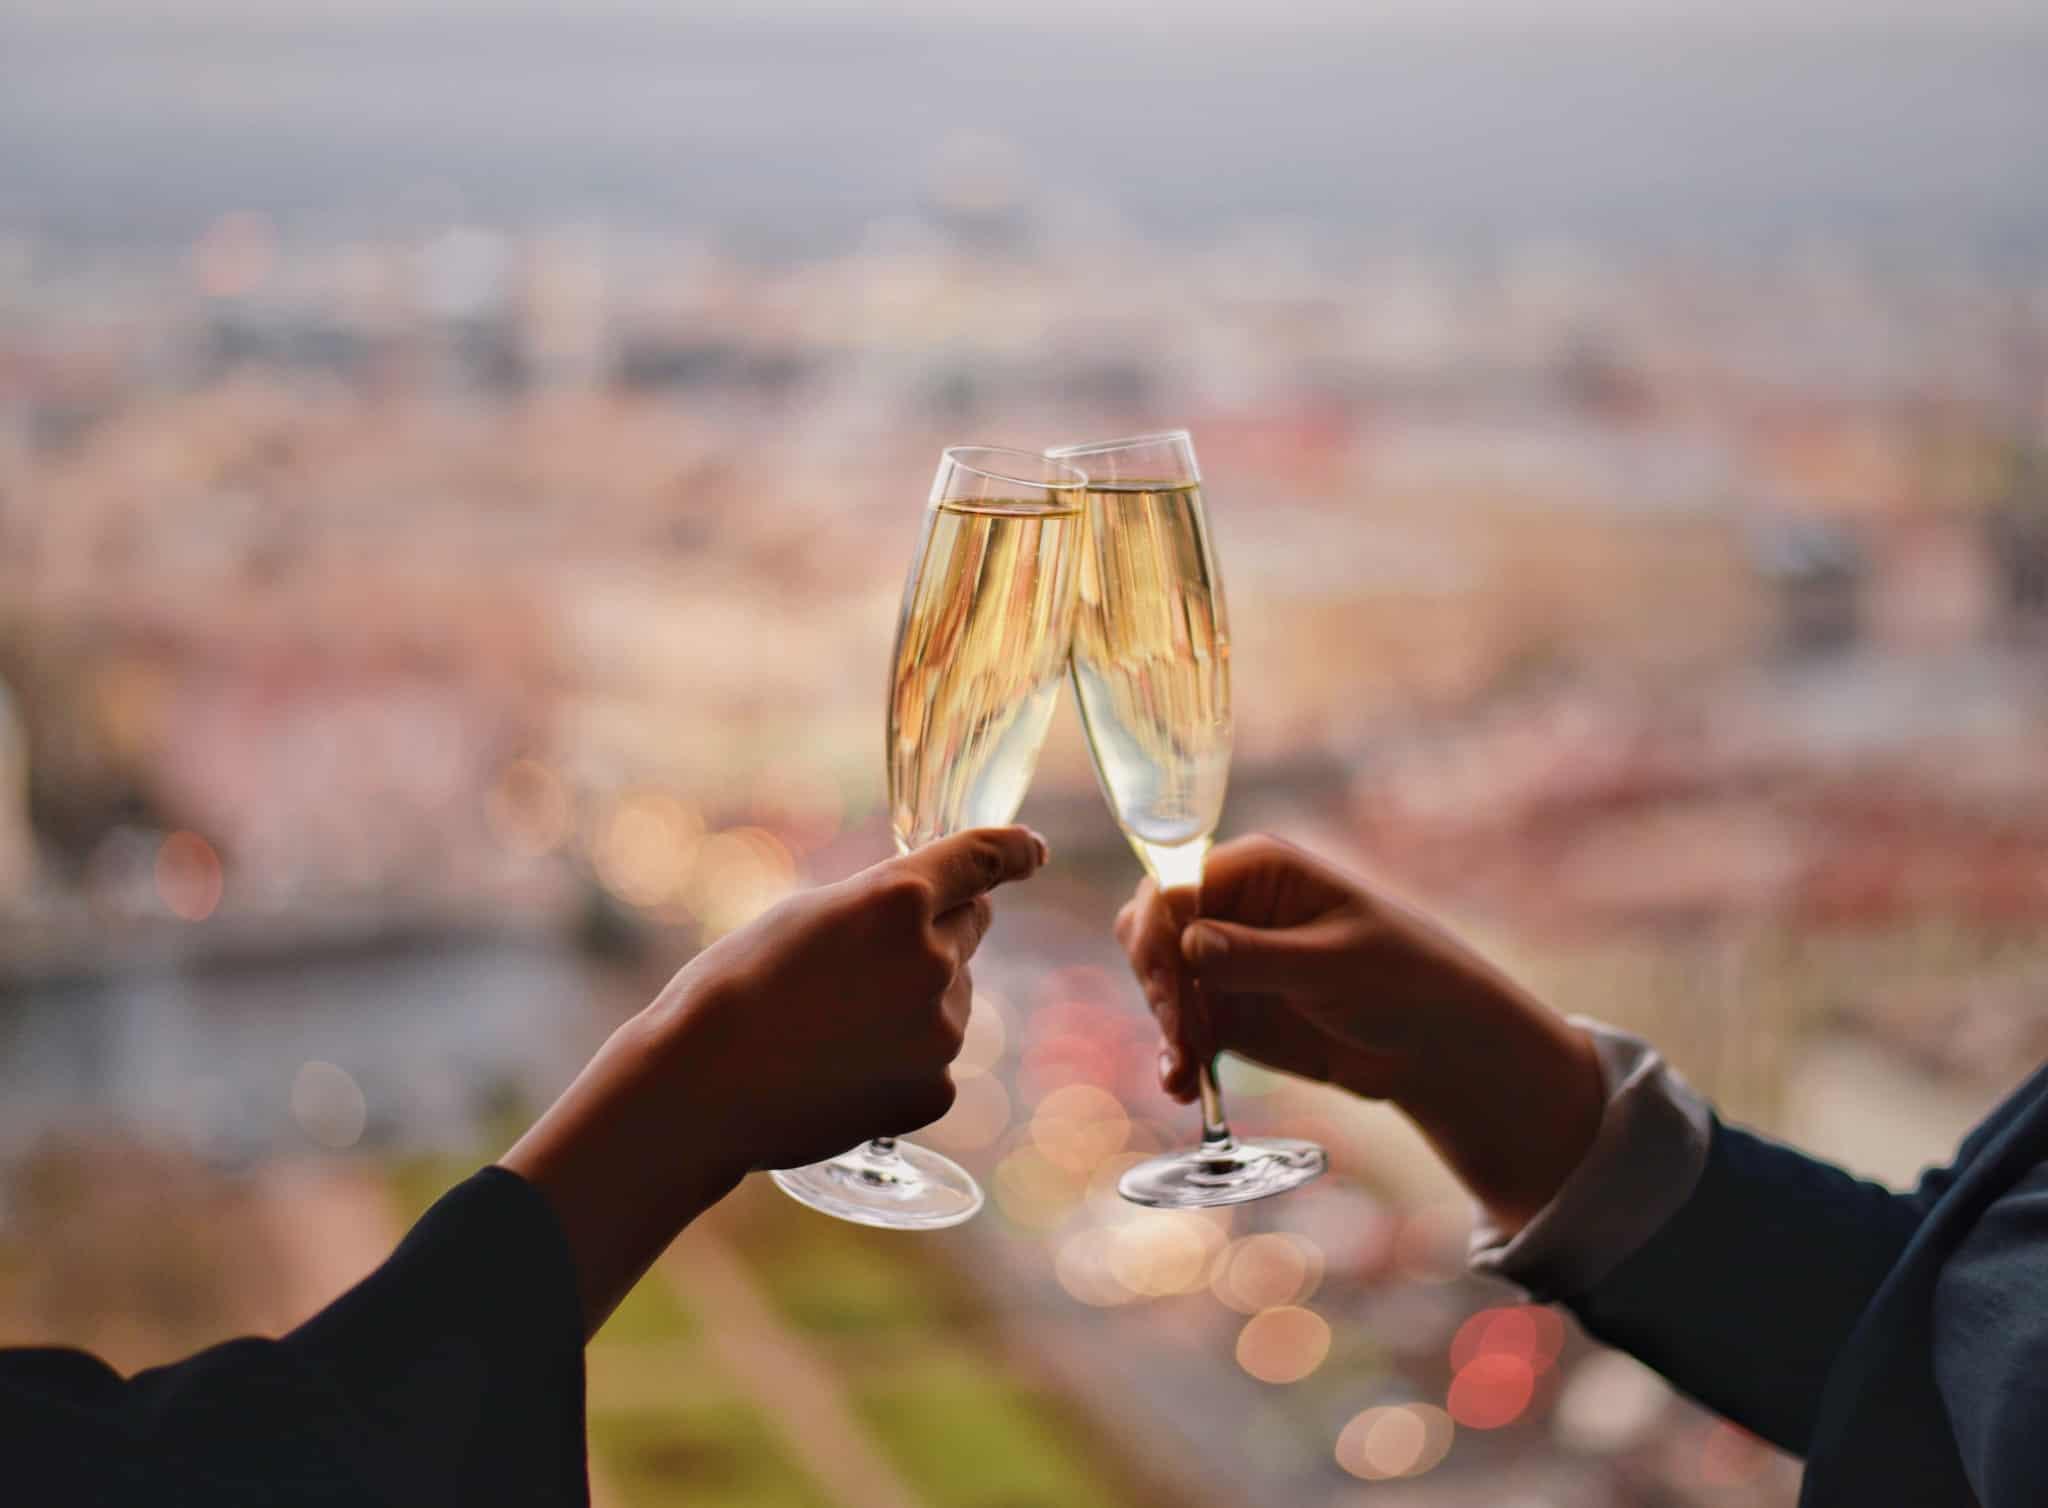 brindes com copos de champagne